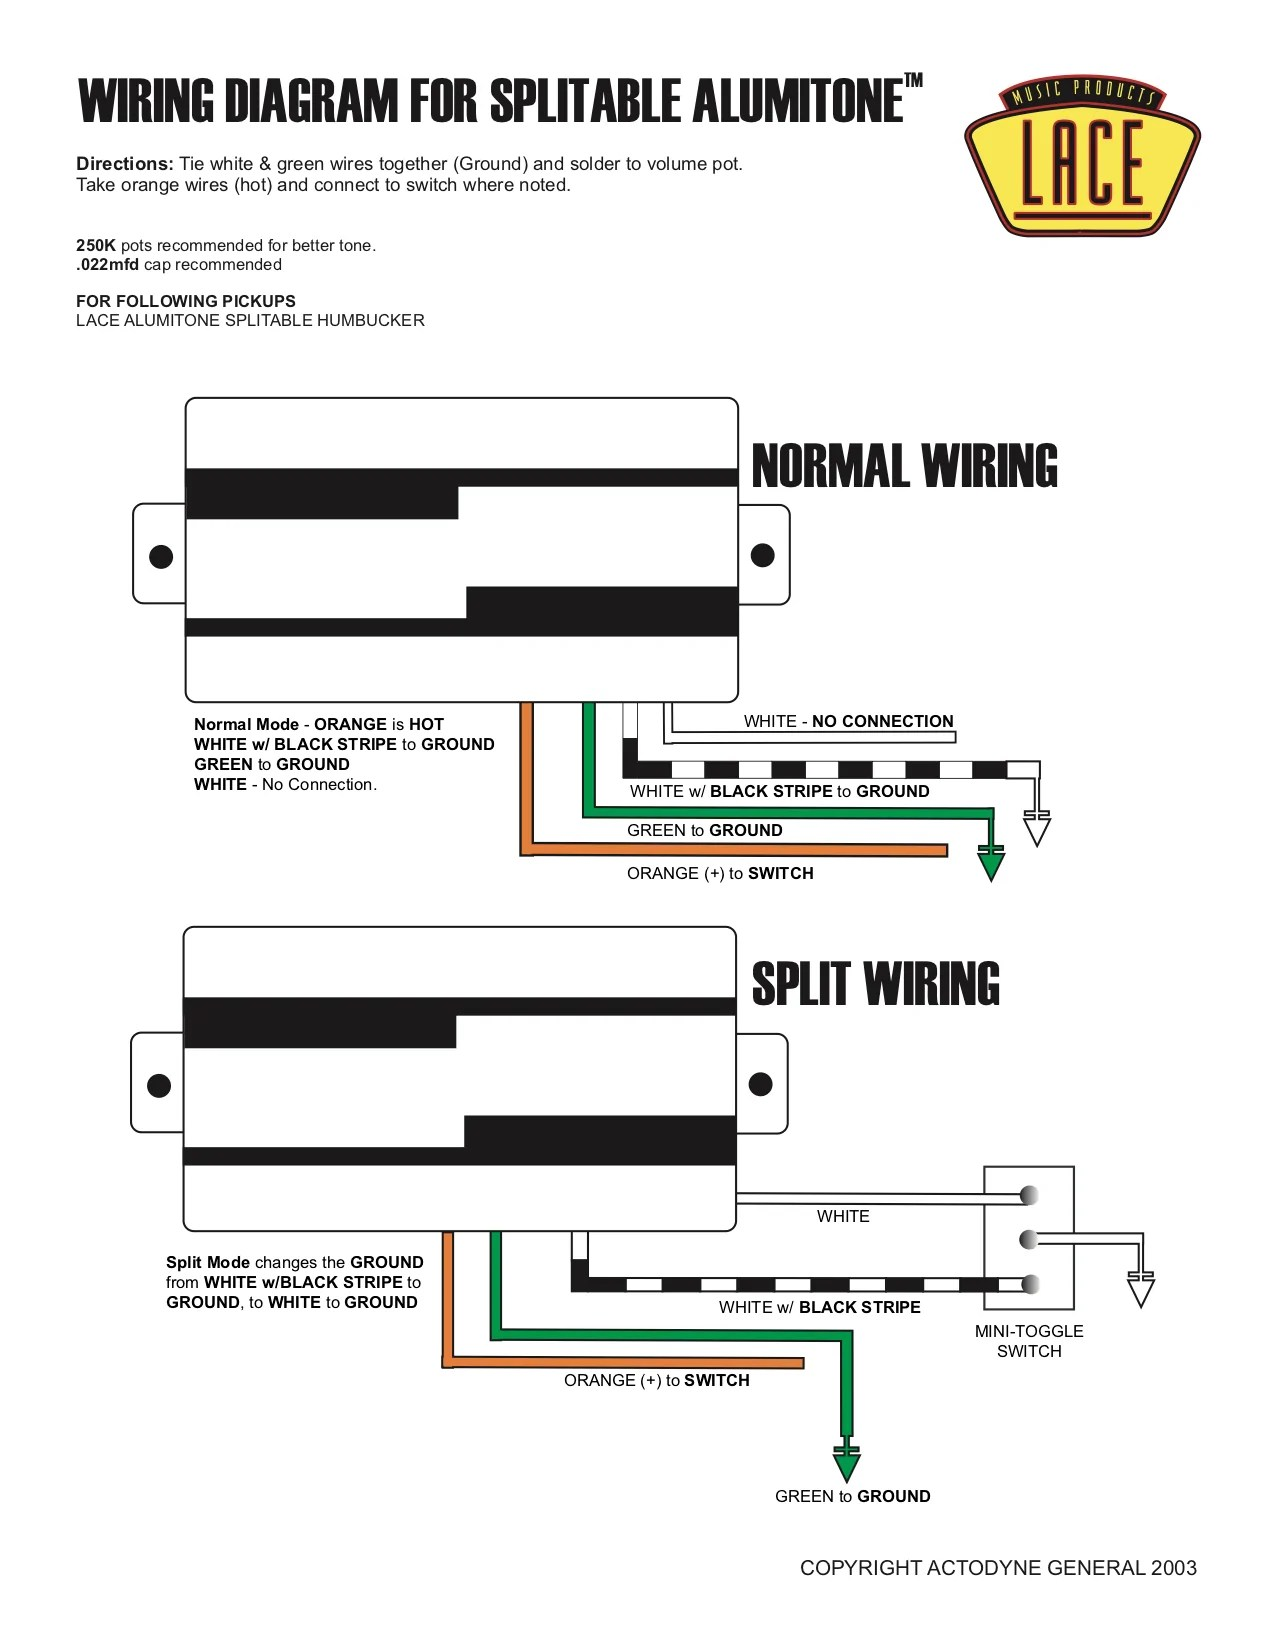 lace pickup wiring wiring diagram lace sensor wiring diagram lace wiring diagram [ 1274 x 1649 Pixel ]